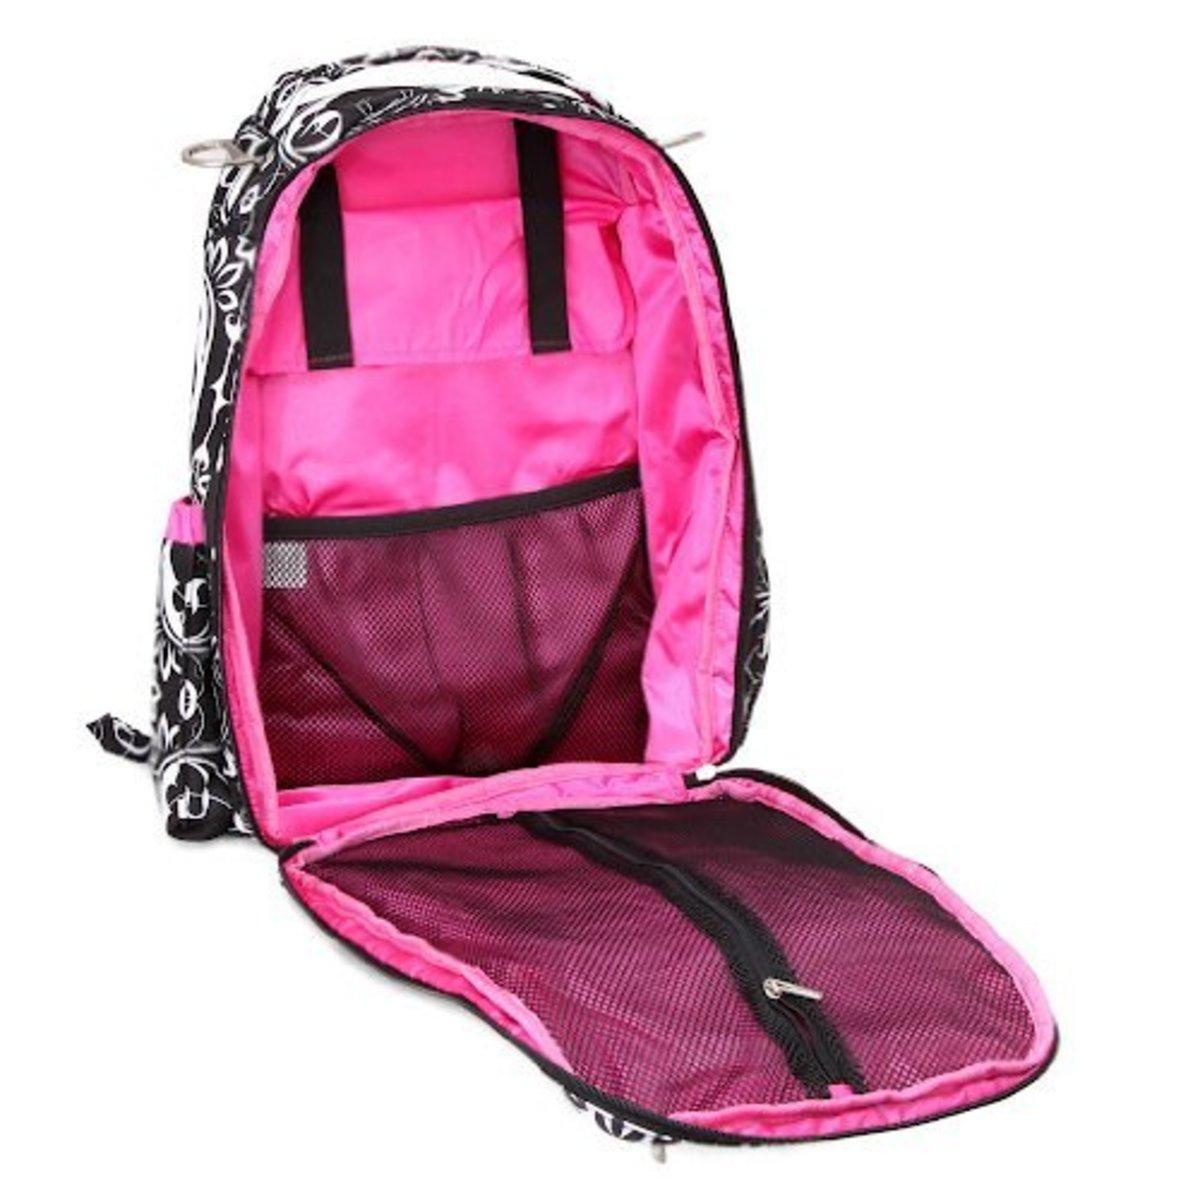 best baby backpack diaper bags 2015 reviews. Black Bedroom Furniture Sets. Home Design Ideas